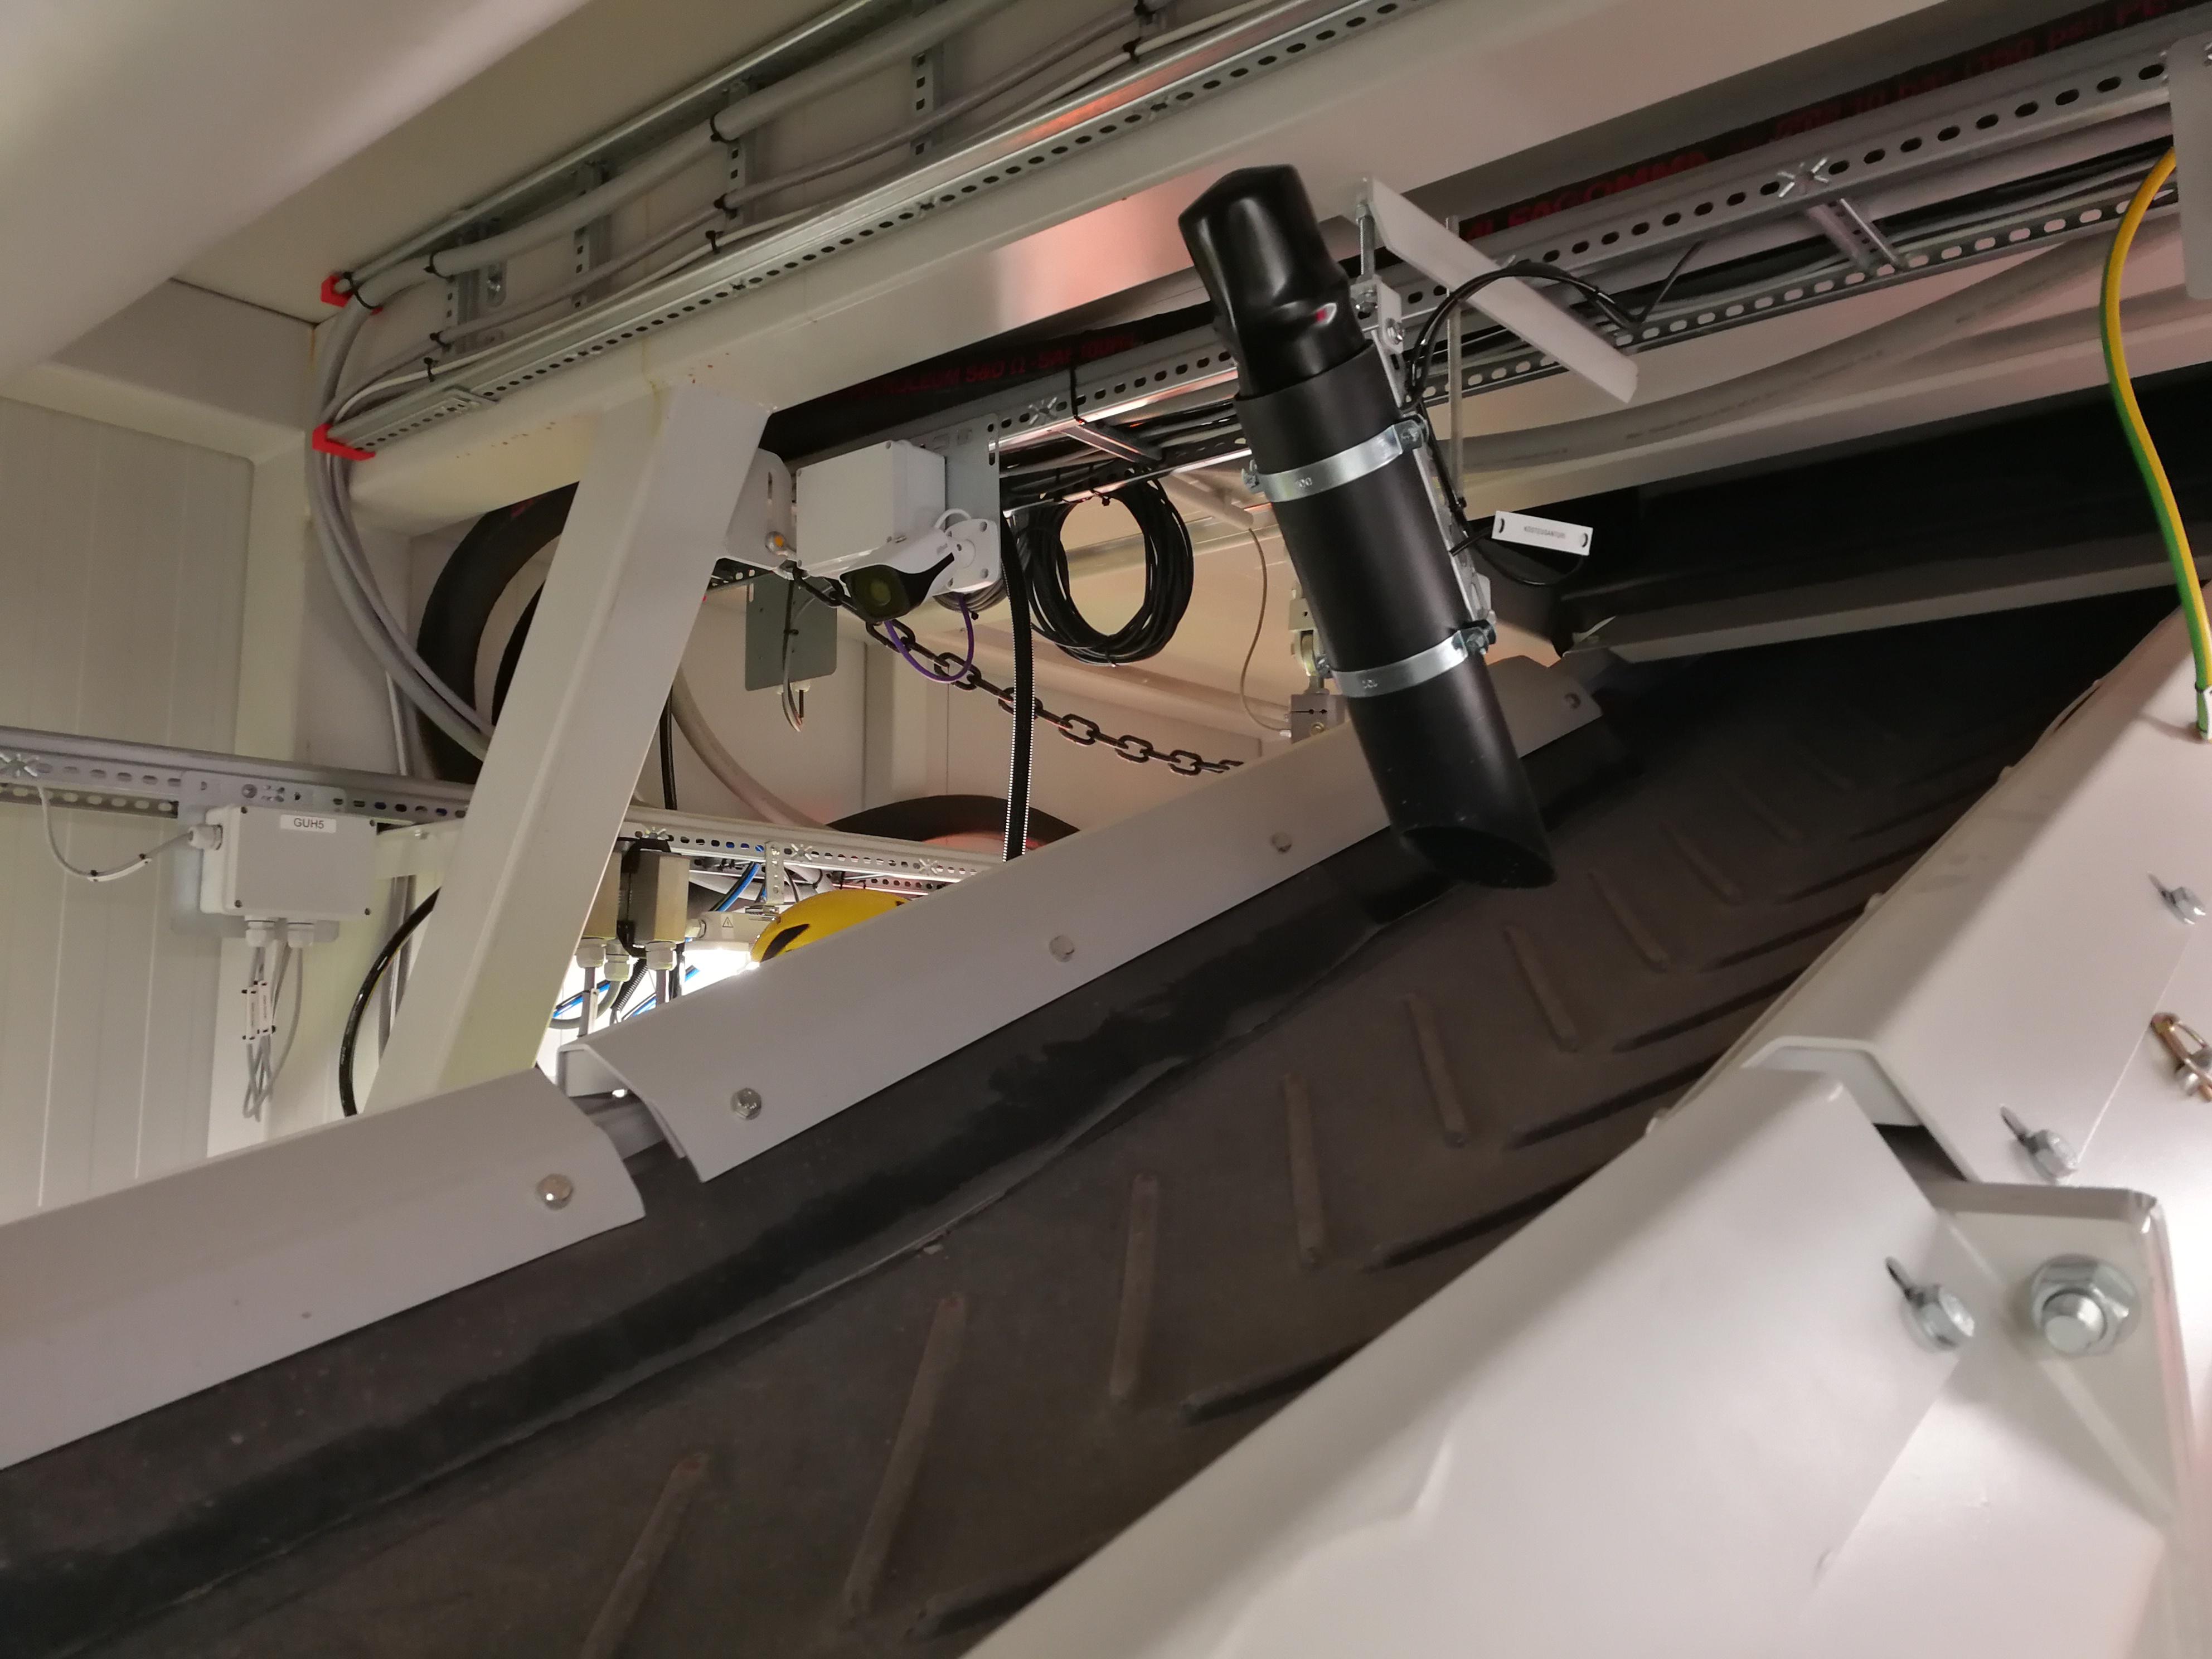 Agregate moisture measuring by optical sensor